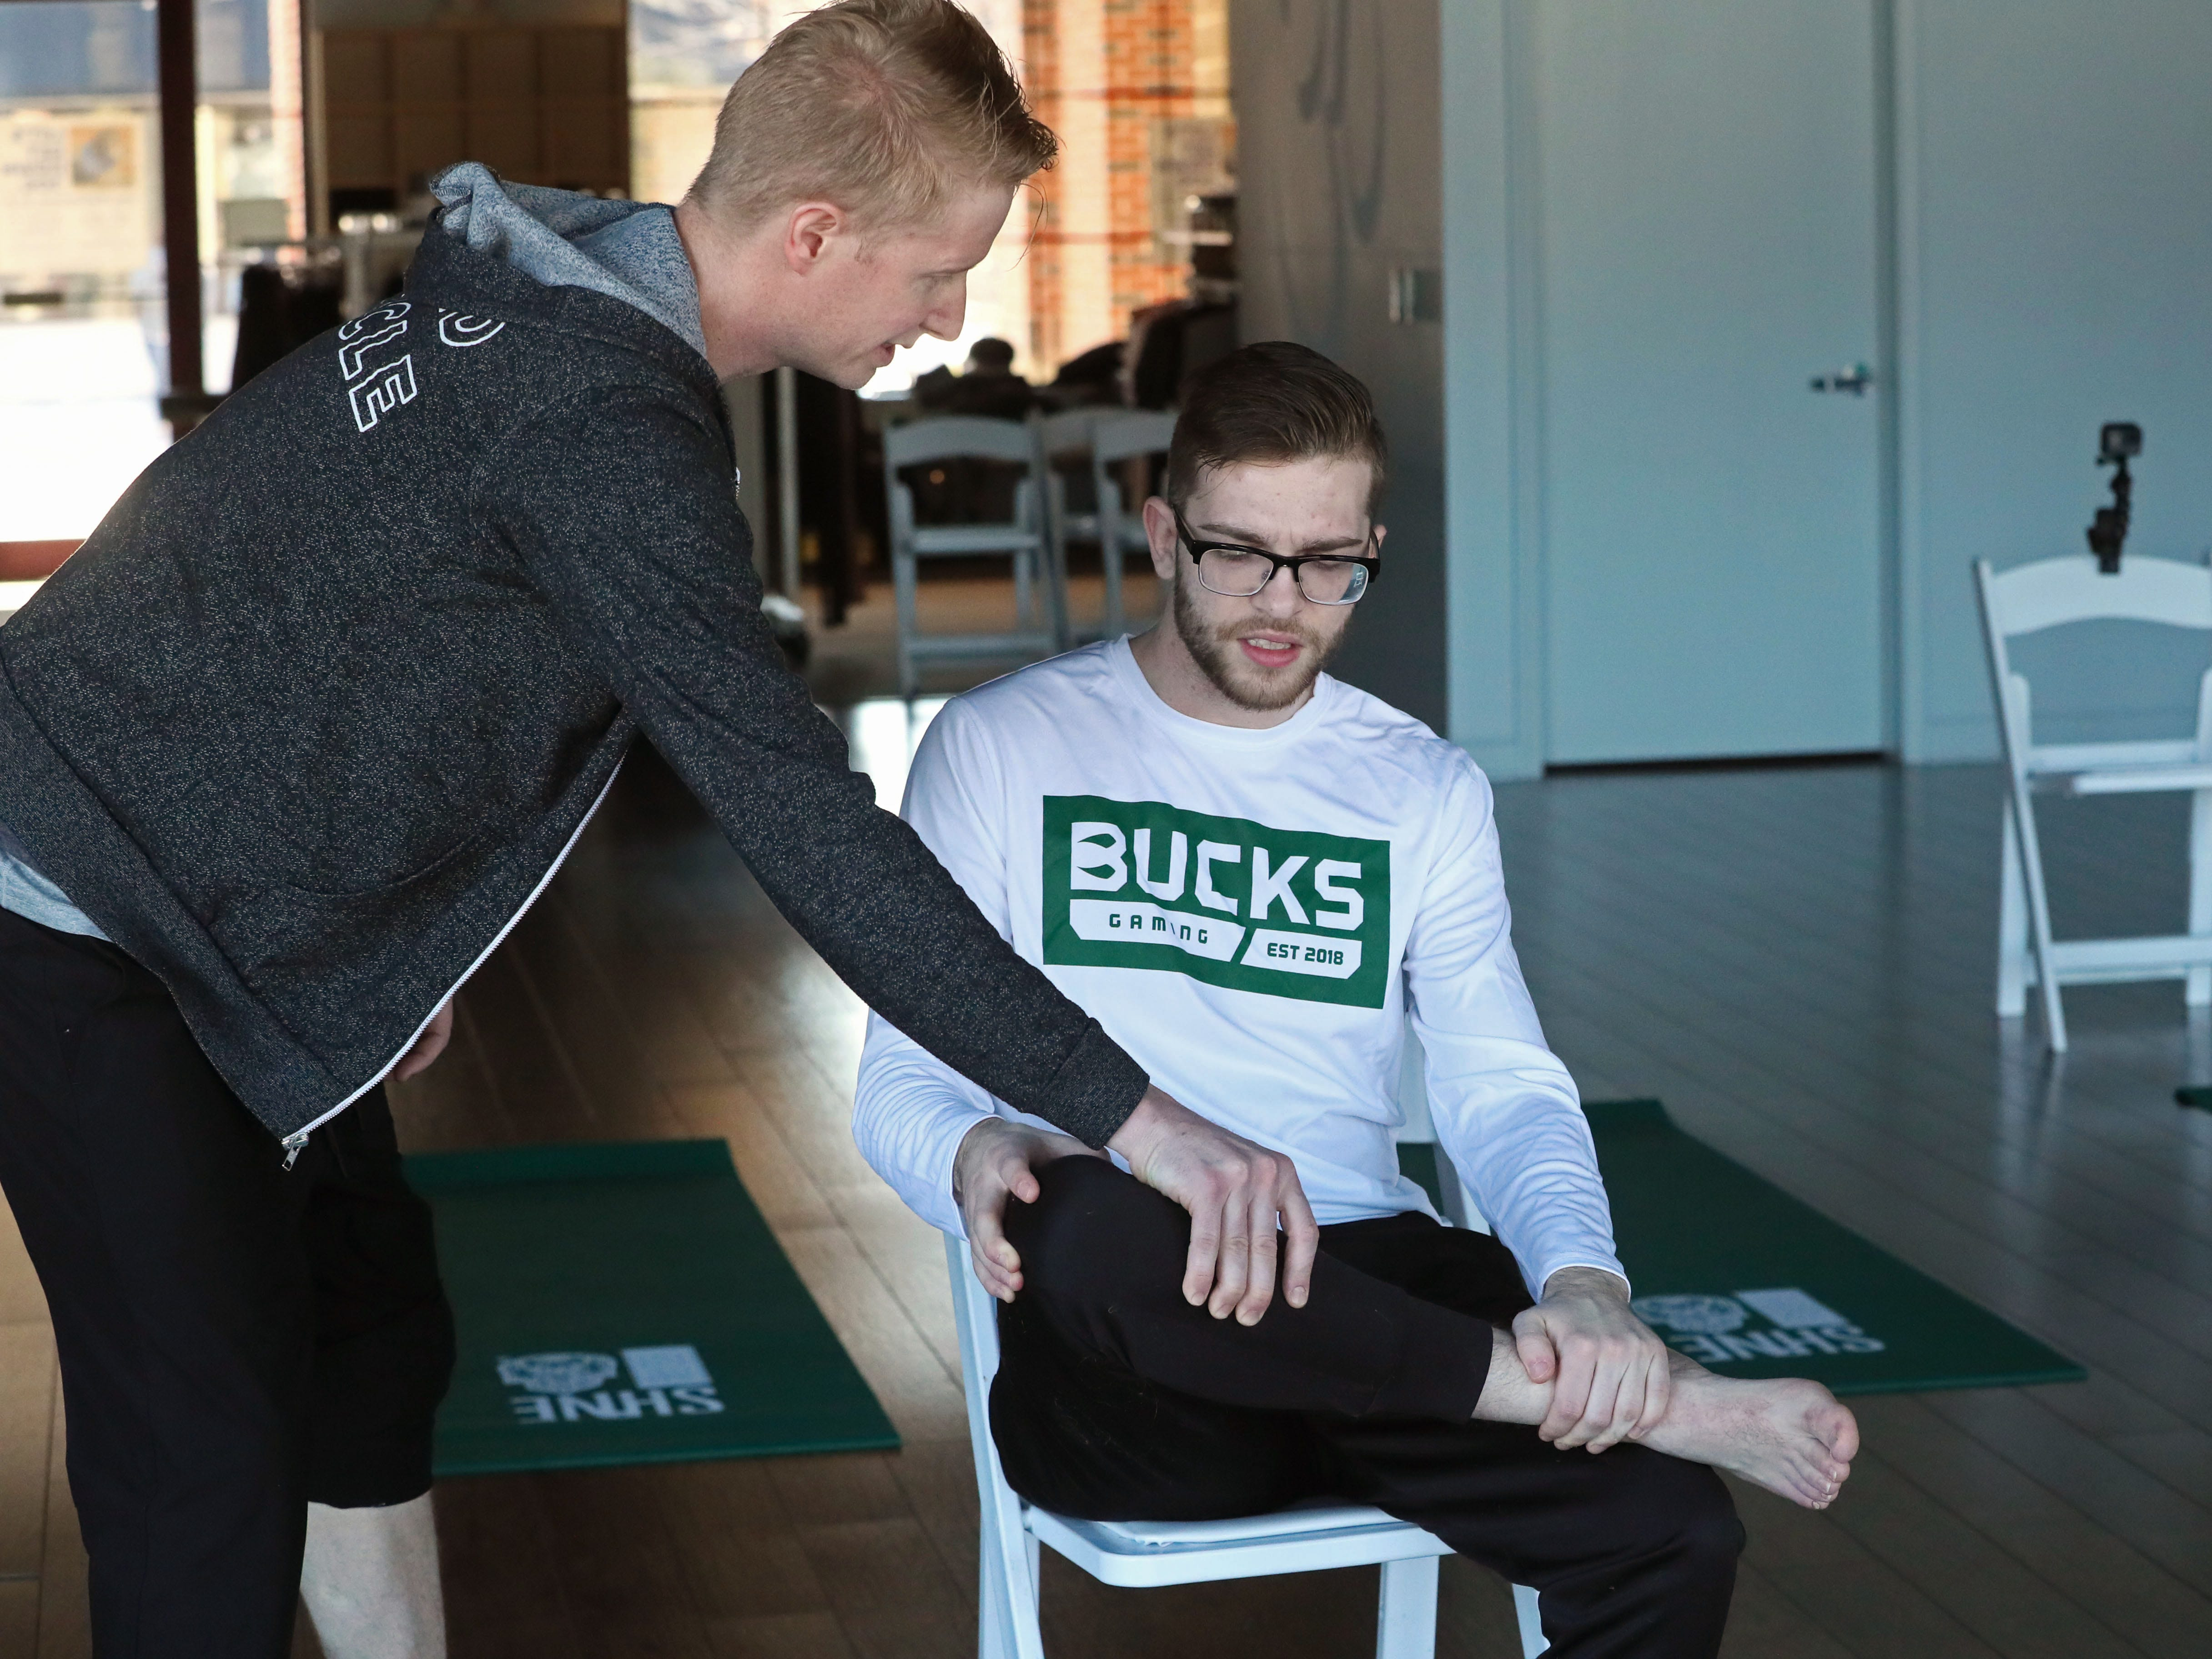 Greg Cartwright helps Bucks Gaming team member Stephen Lay.